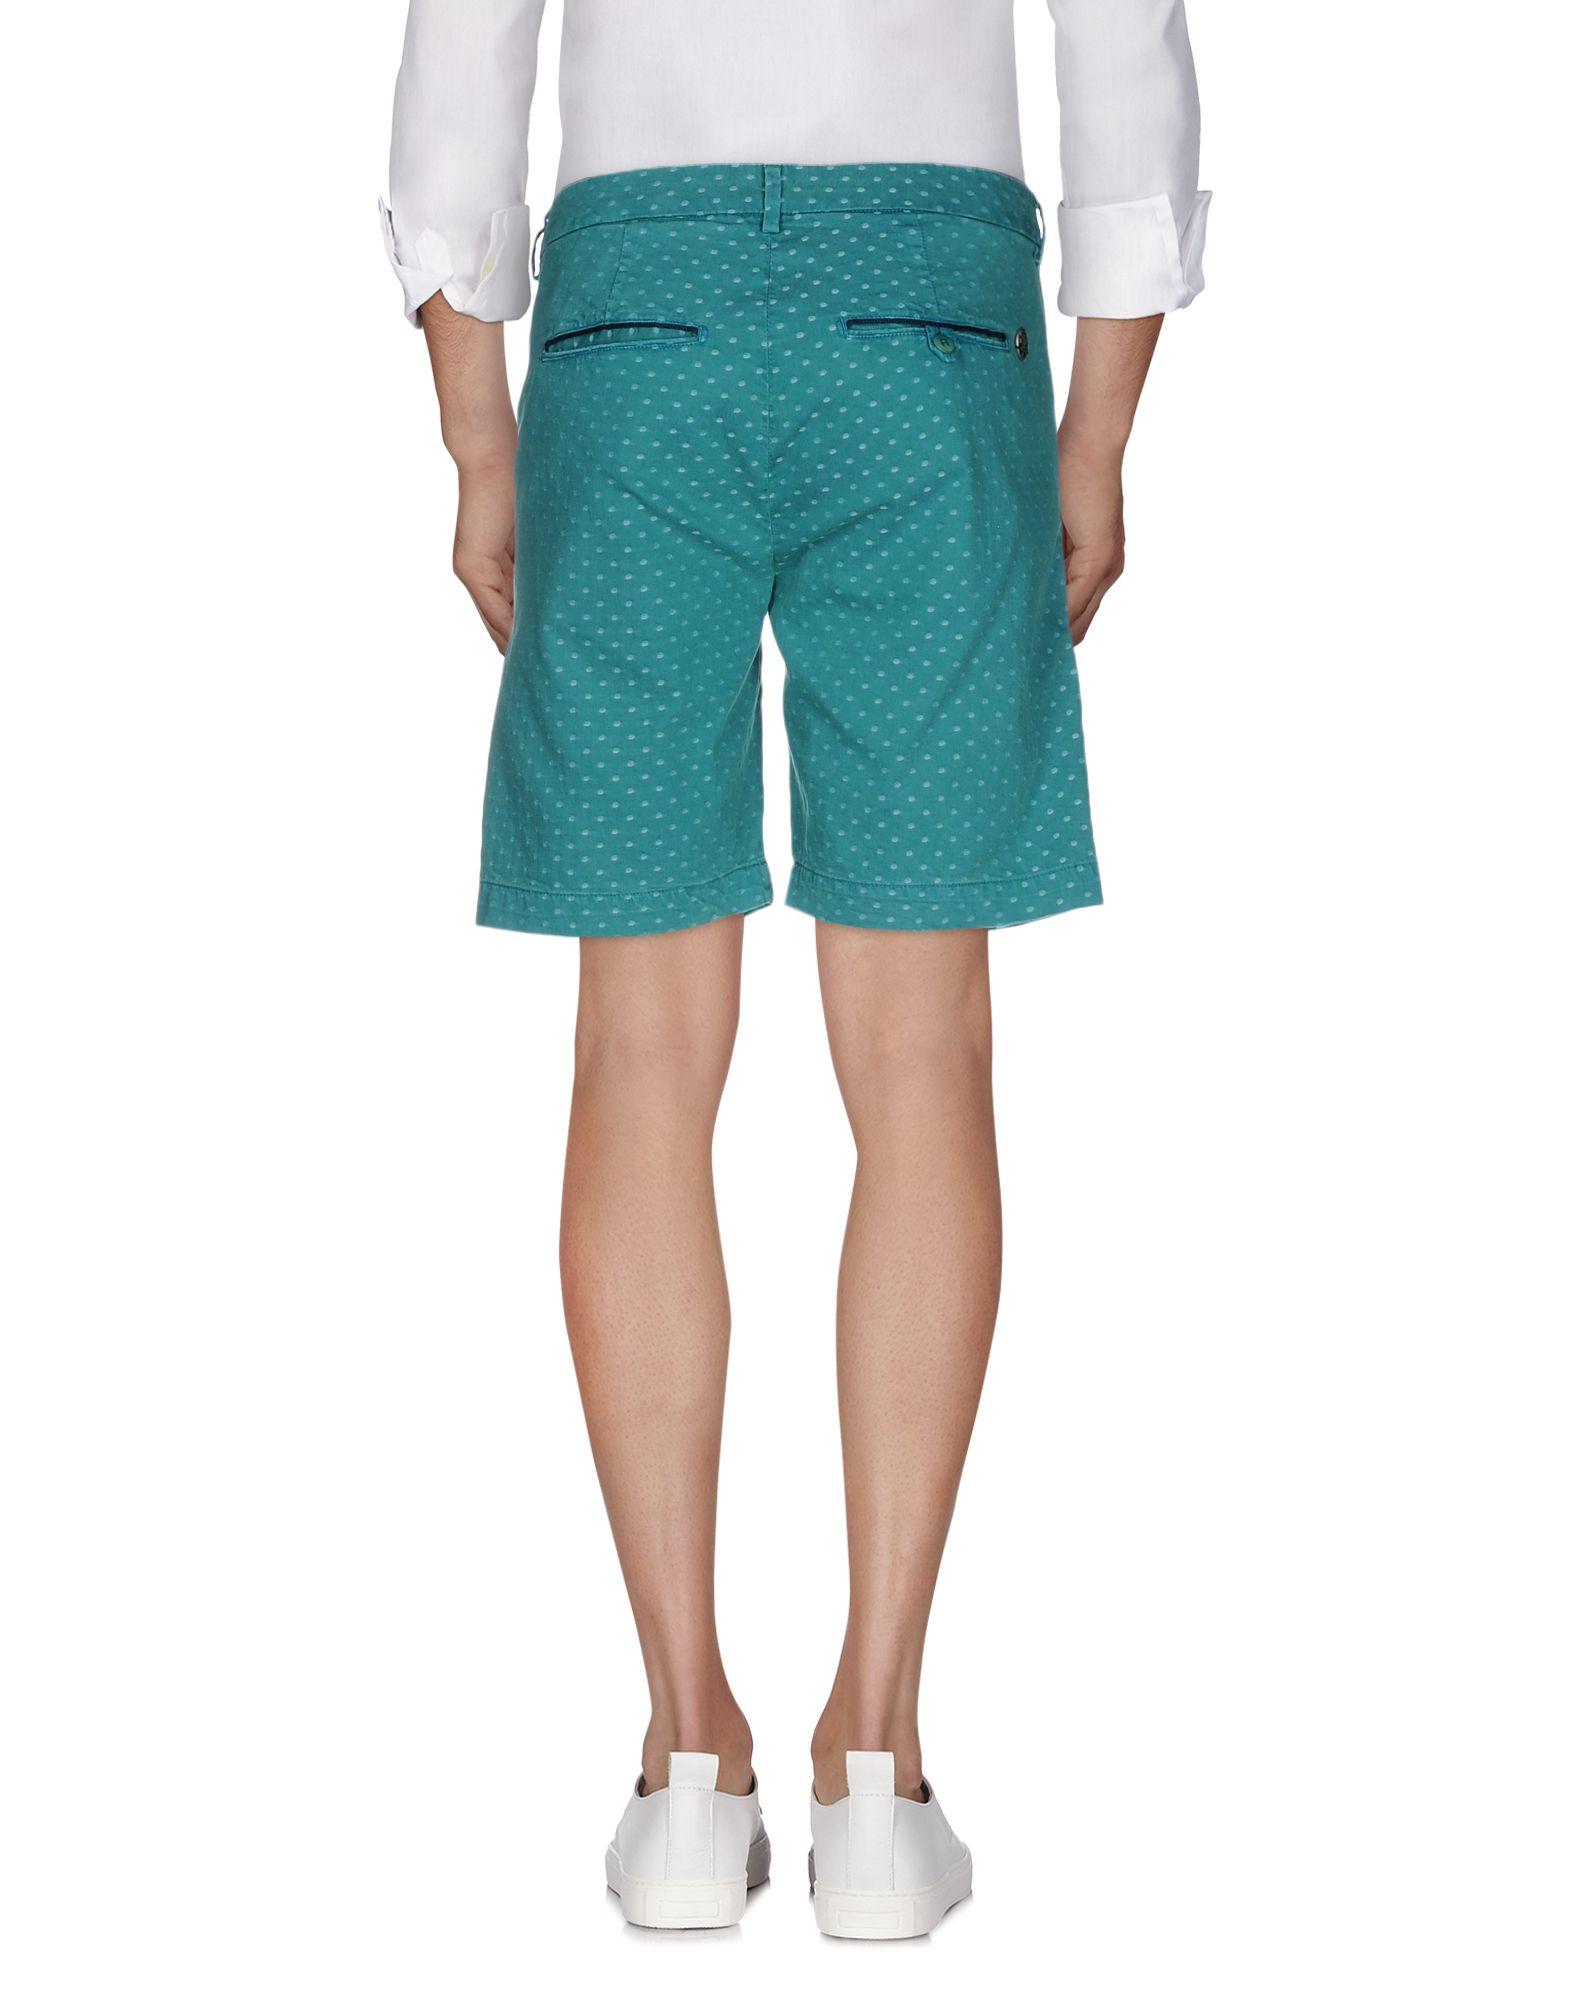 Shorts & & Shorts Bermuda San Francisco '976 Uomo - 36794647BJ ee40eb